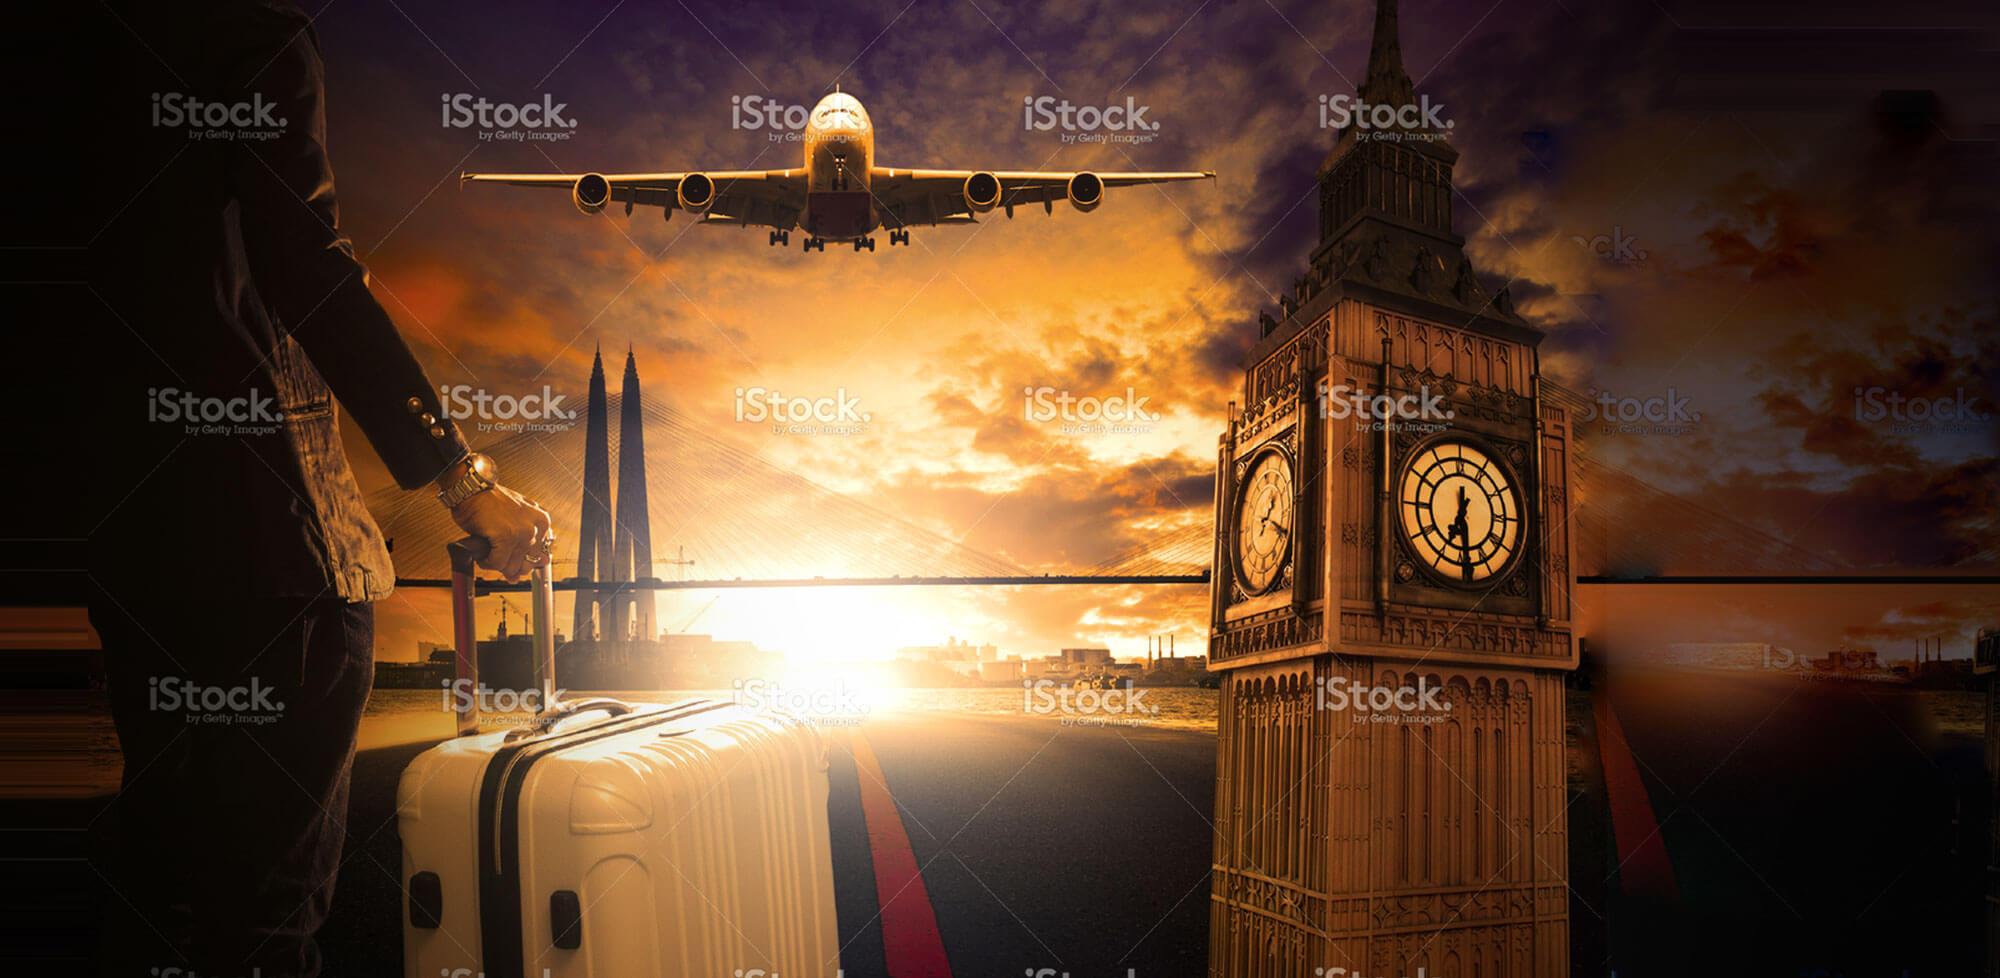 London Heathrow (LHC)